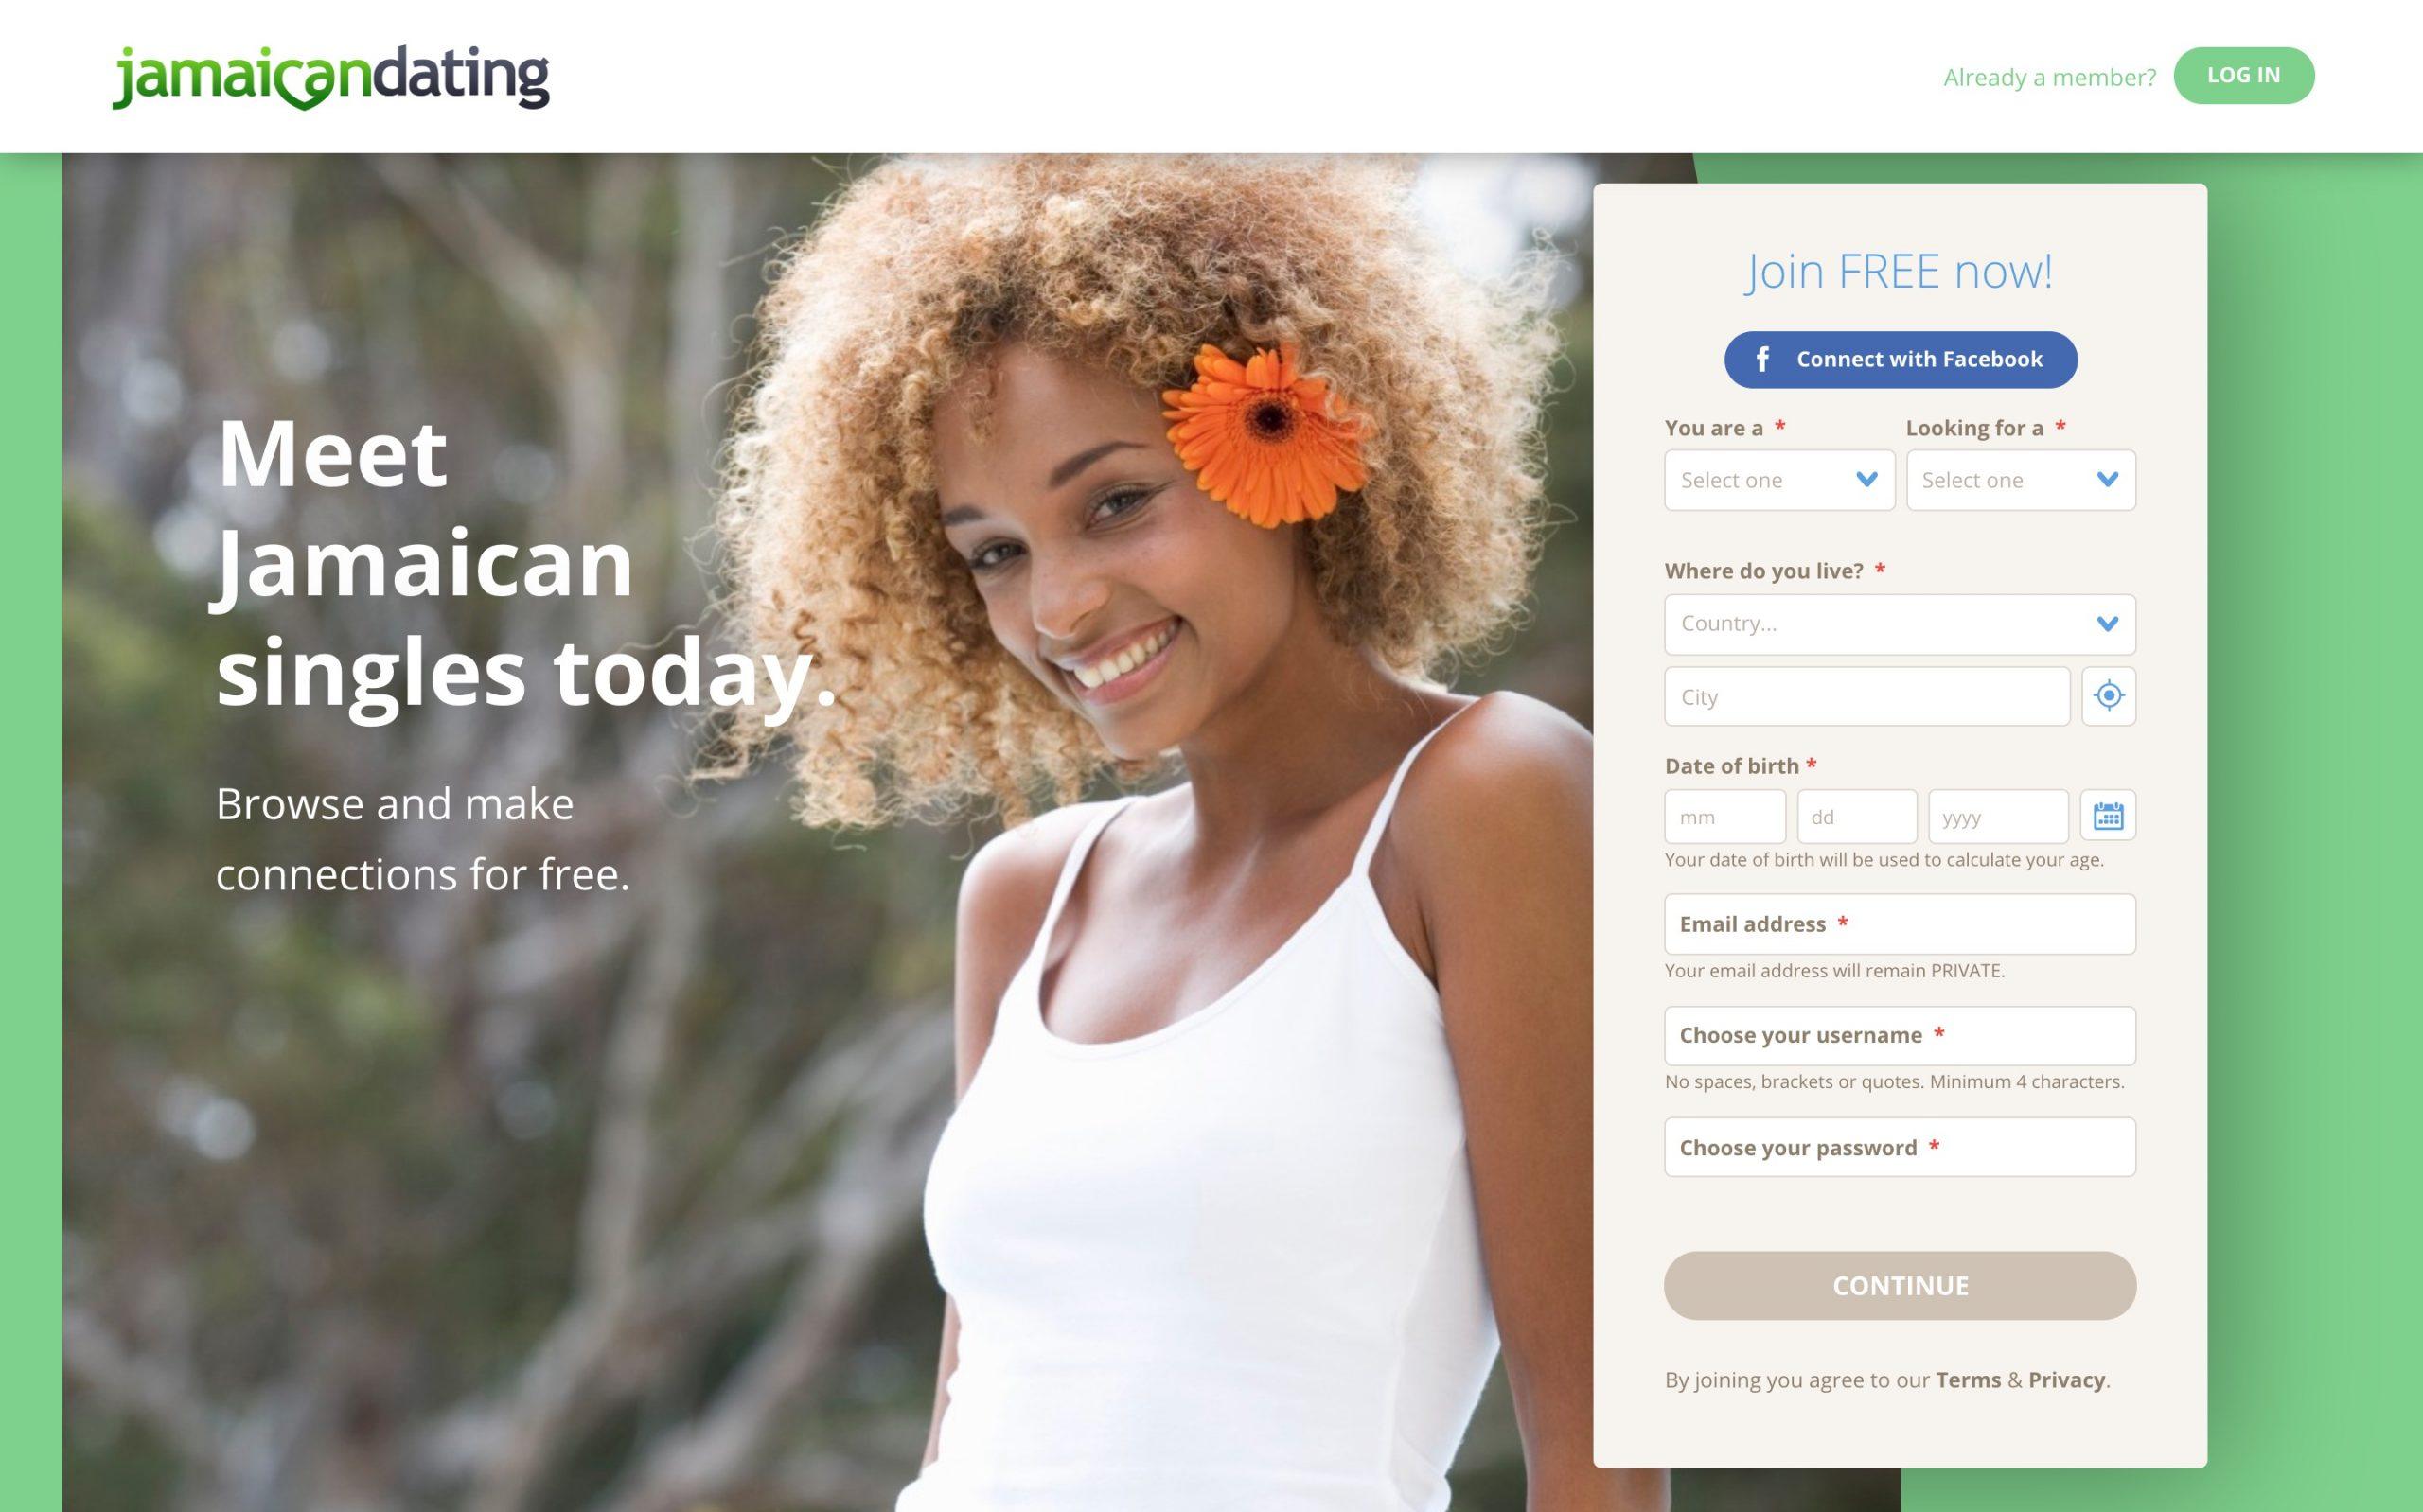 JamaicanDating main page